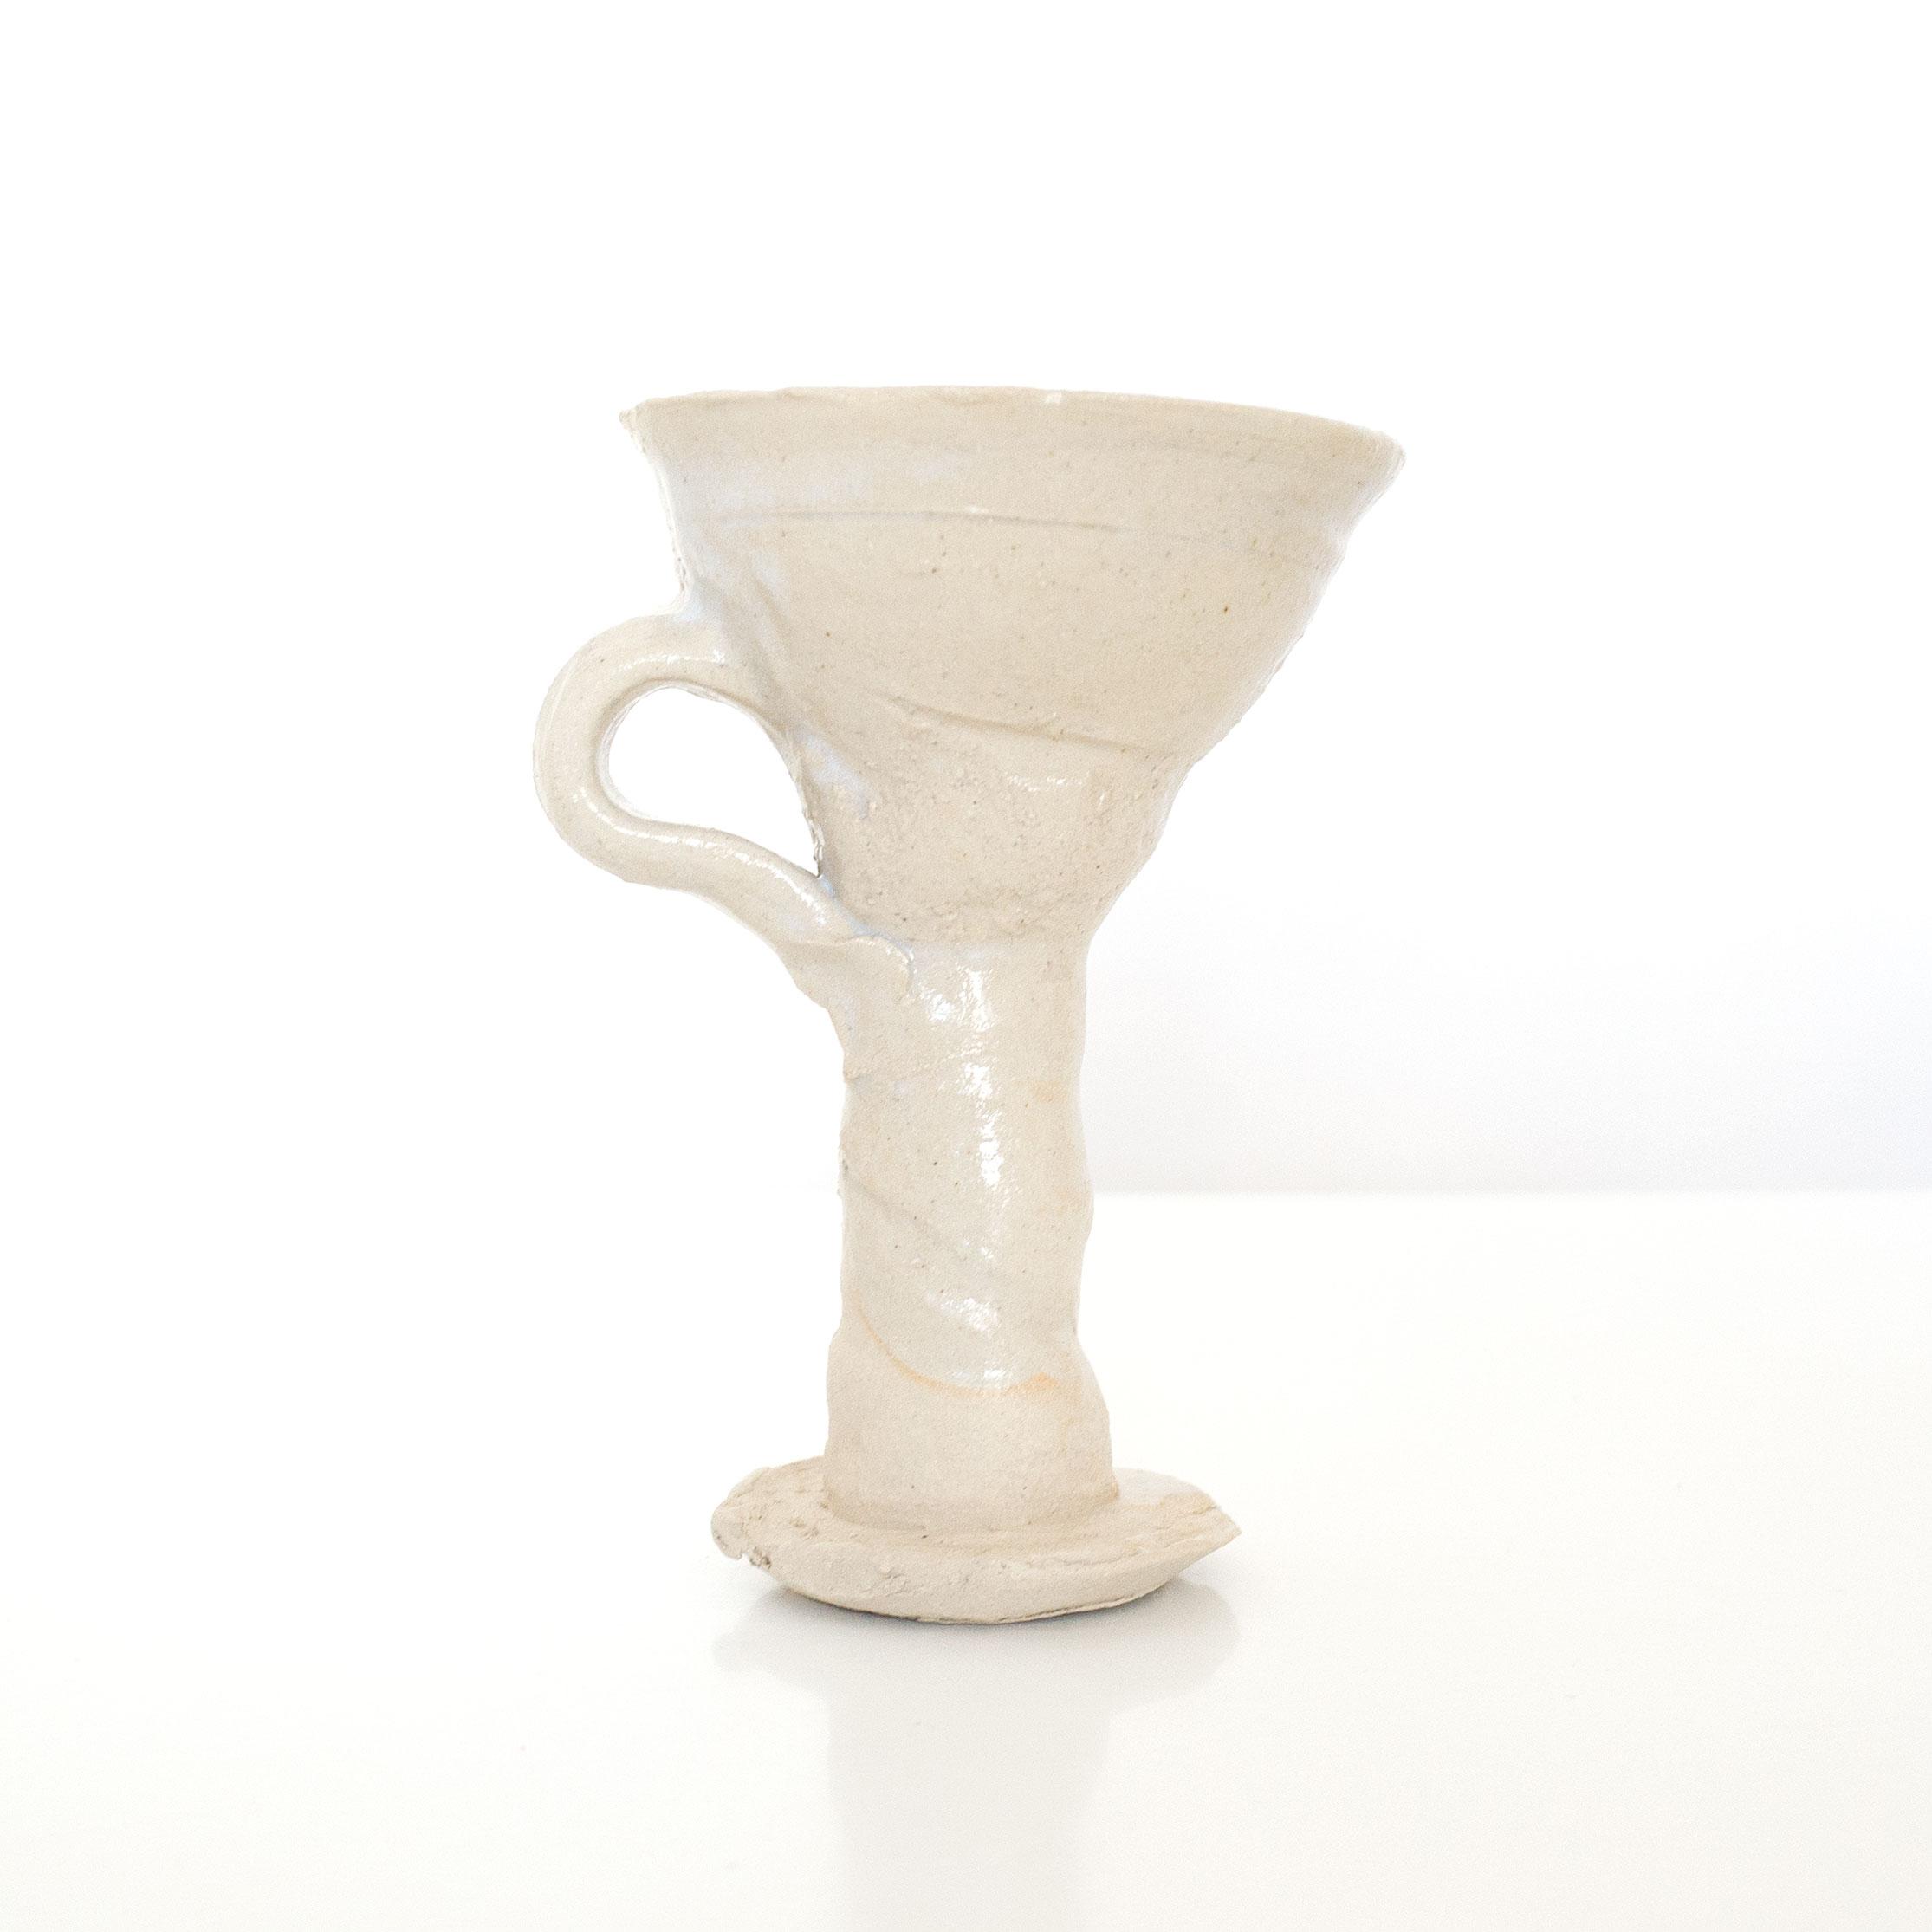 Erik Haugsby Pottery handmade ceramic chalice goblet